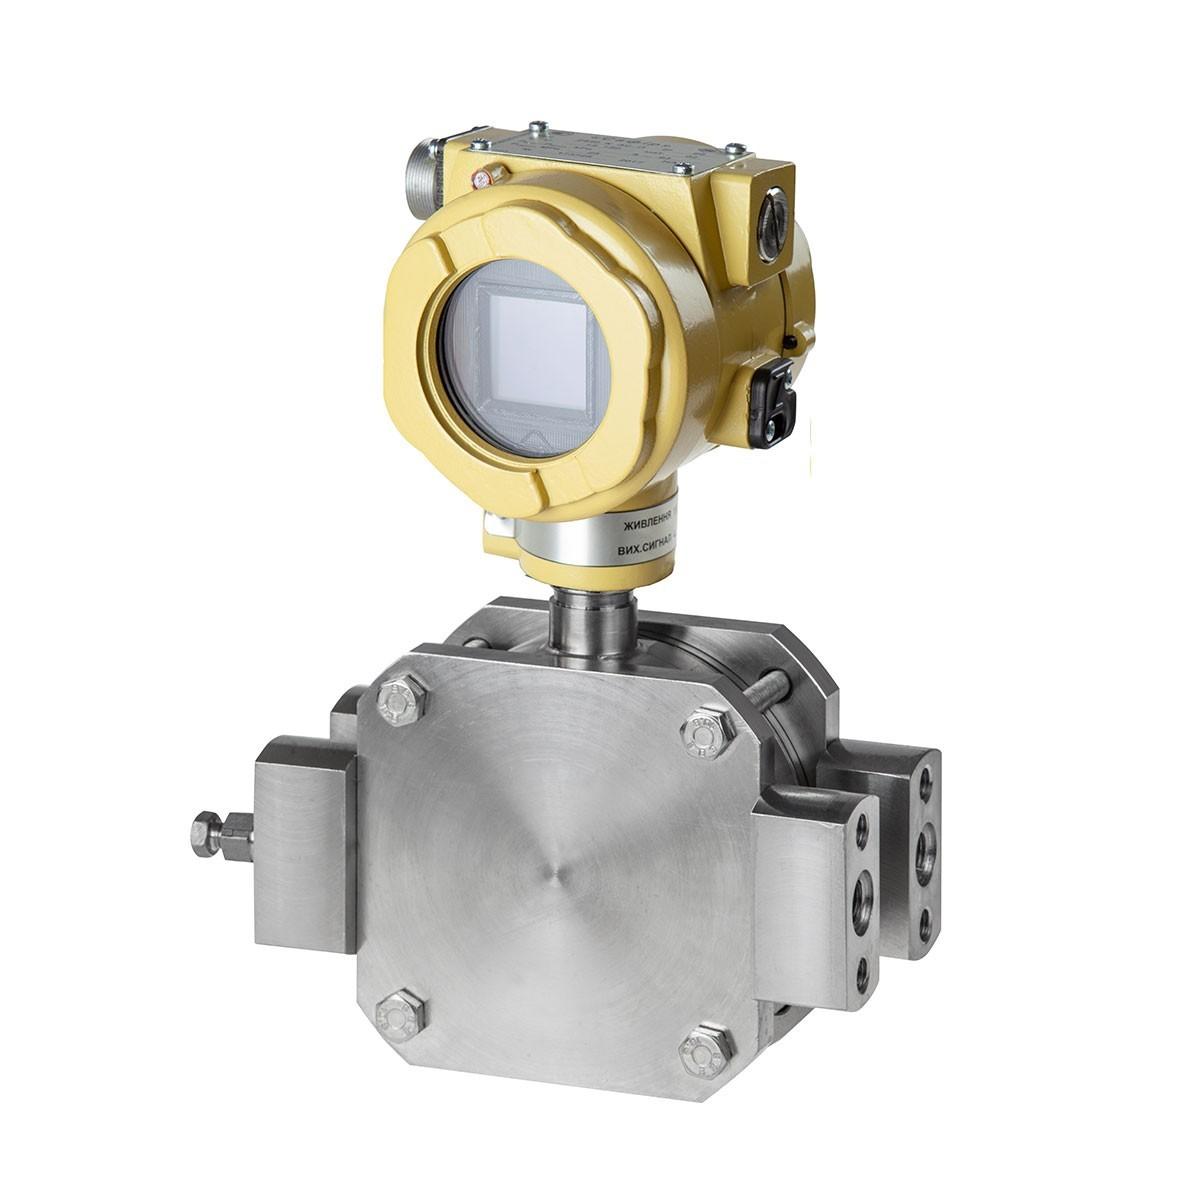 Smart Differential Pressure Transmitters Safir 2401 K